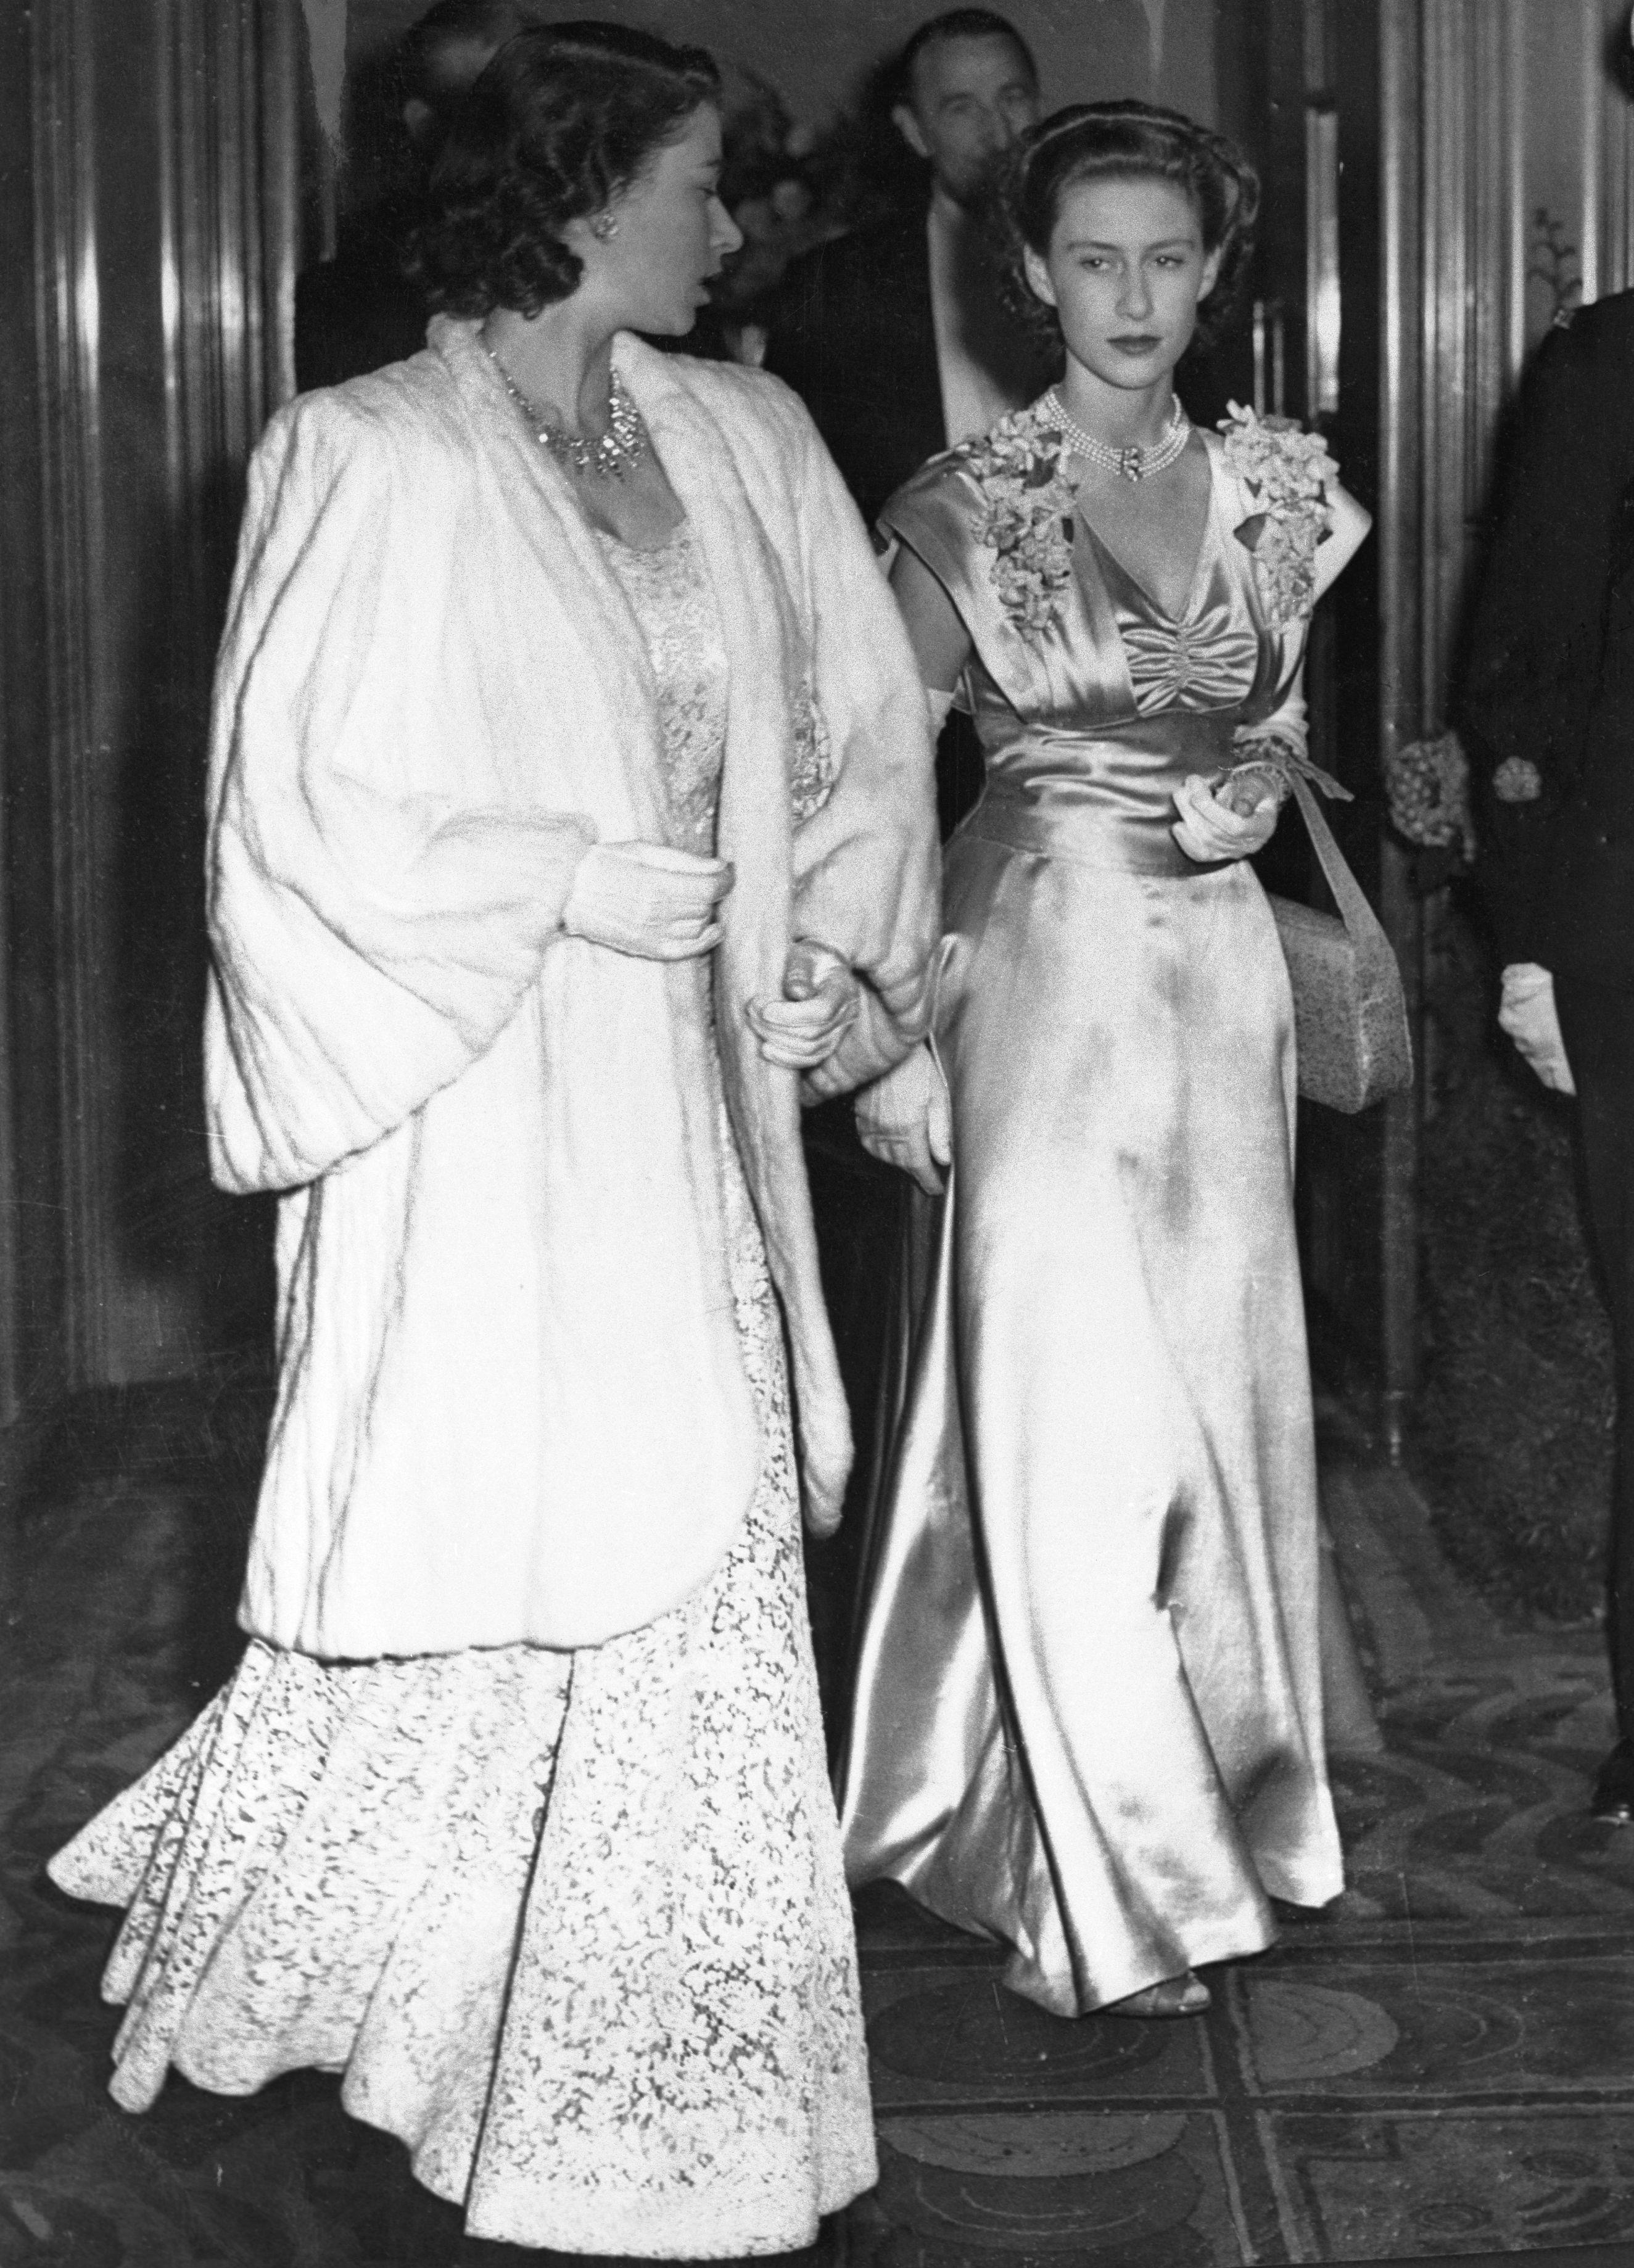 50 Photos Of Queen Elizabeth And Her Sister Princess Margaret Together